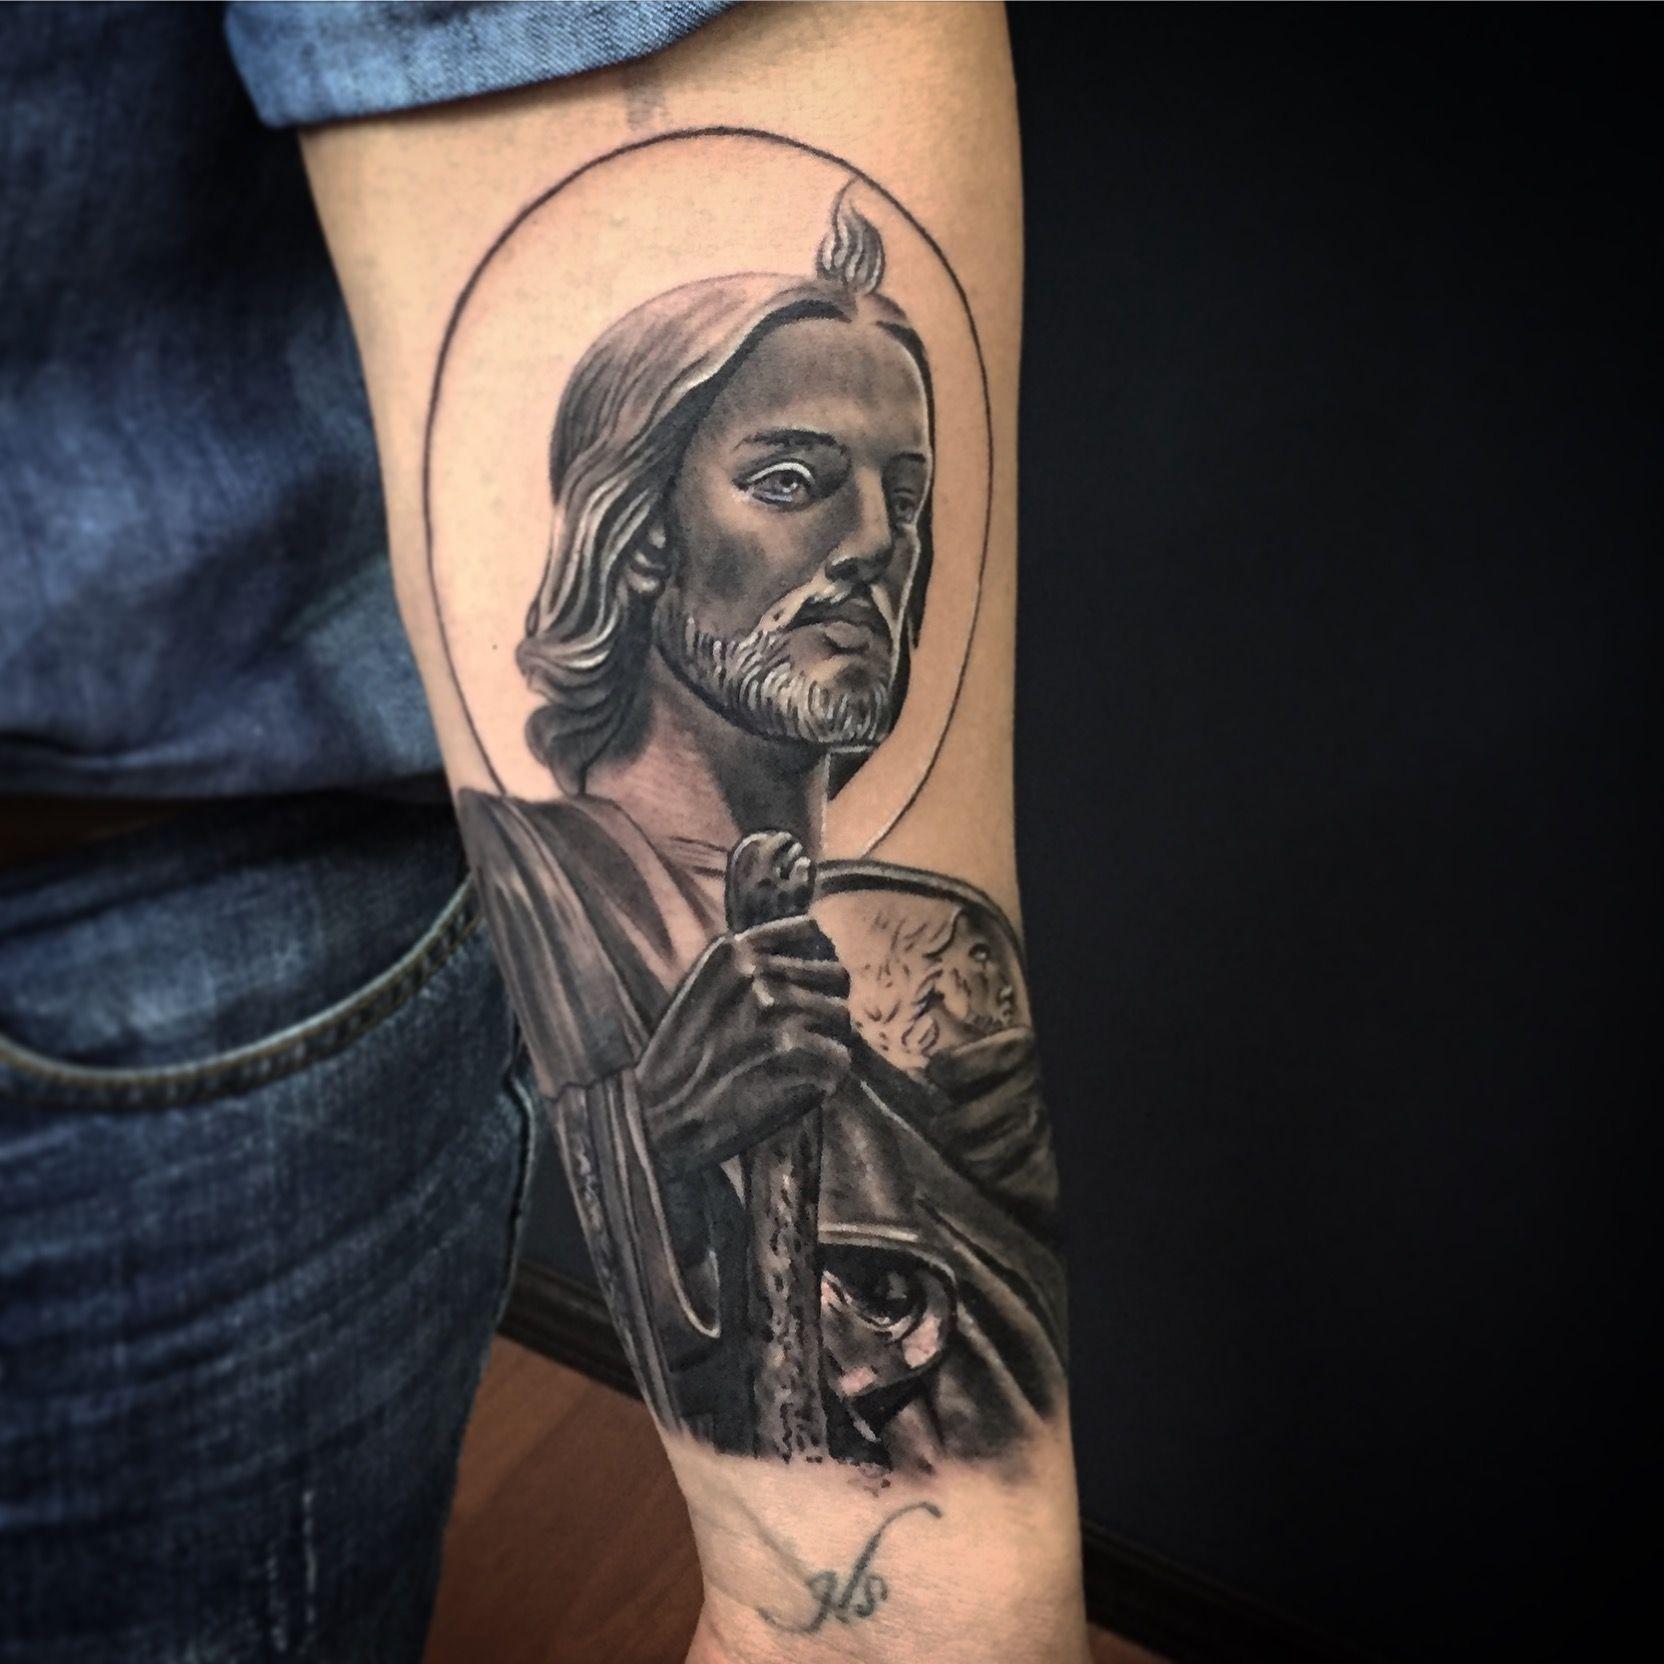 Descargar Gratis Diseno Ideas Originales Para Tatuajes Disenos Unicos Para Cada Person Tatuaje Mama Tatuajes Religiosos Para Hombres Tatuajes Religiosos